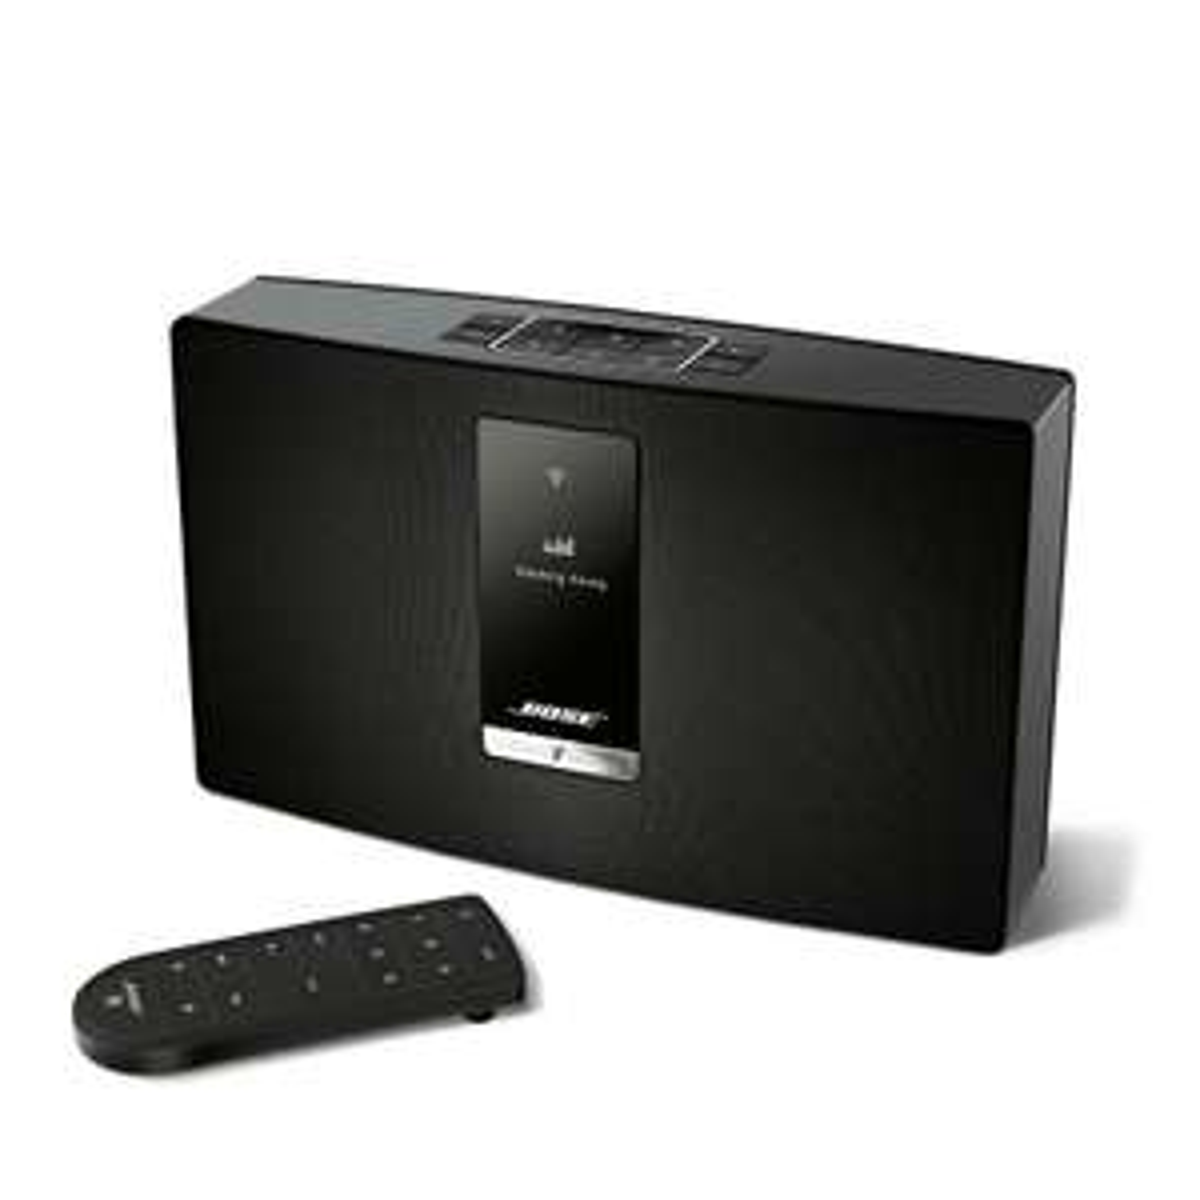 Enceinte multiroom Wi-Fi Bose SoundTouch Série II Noire ou Blanche